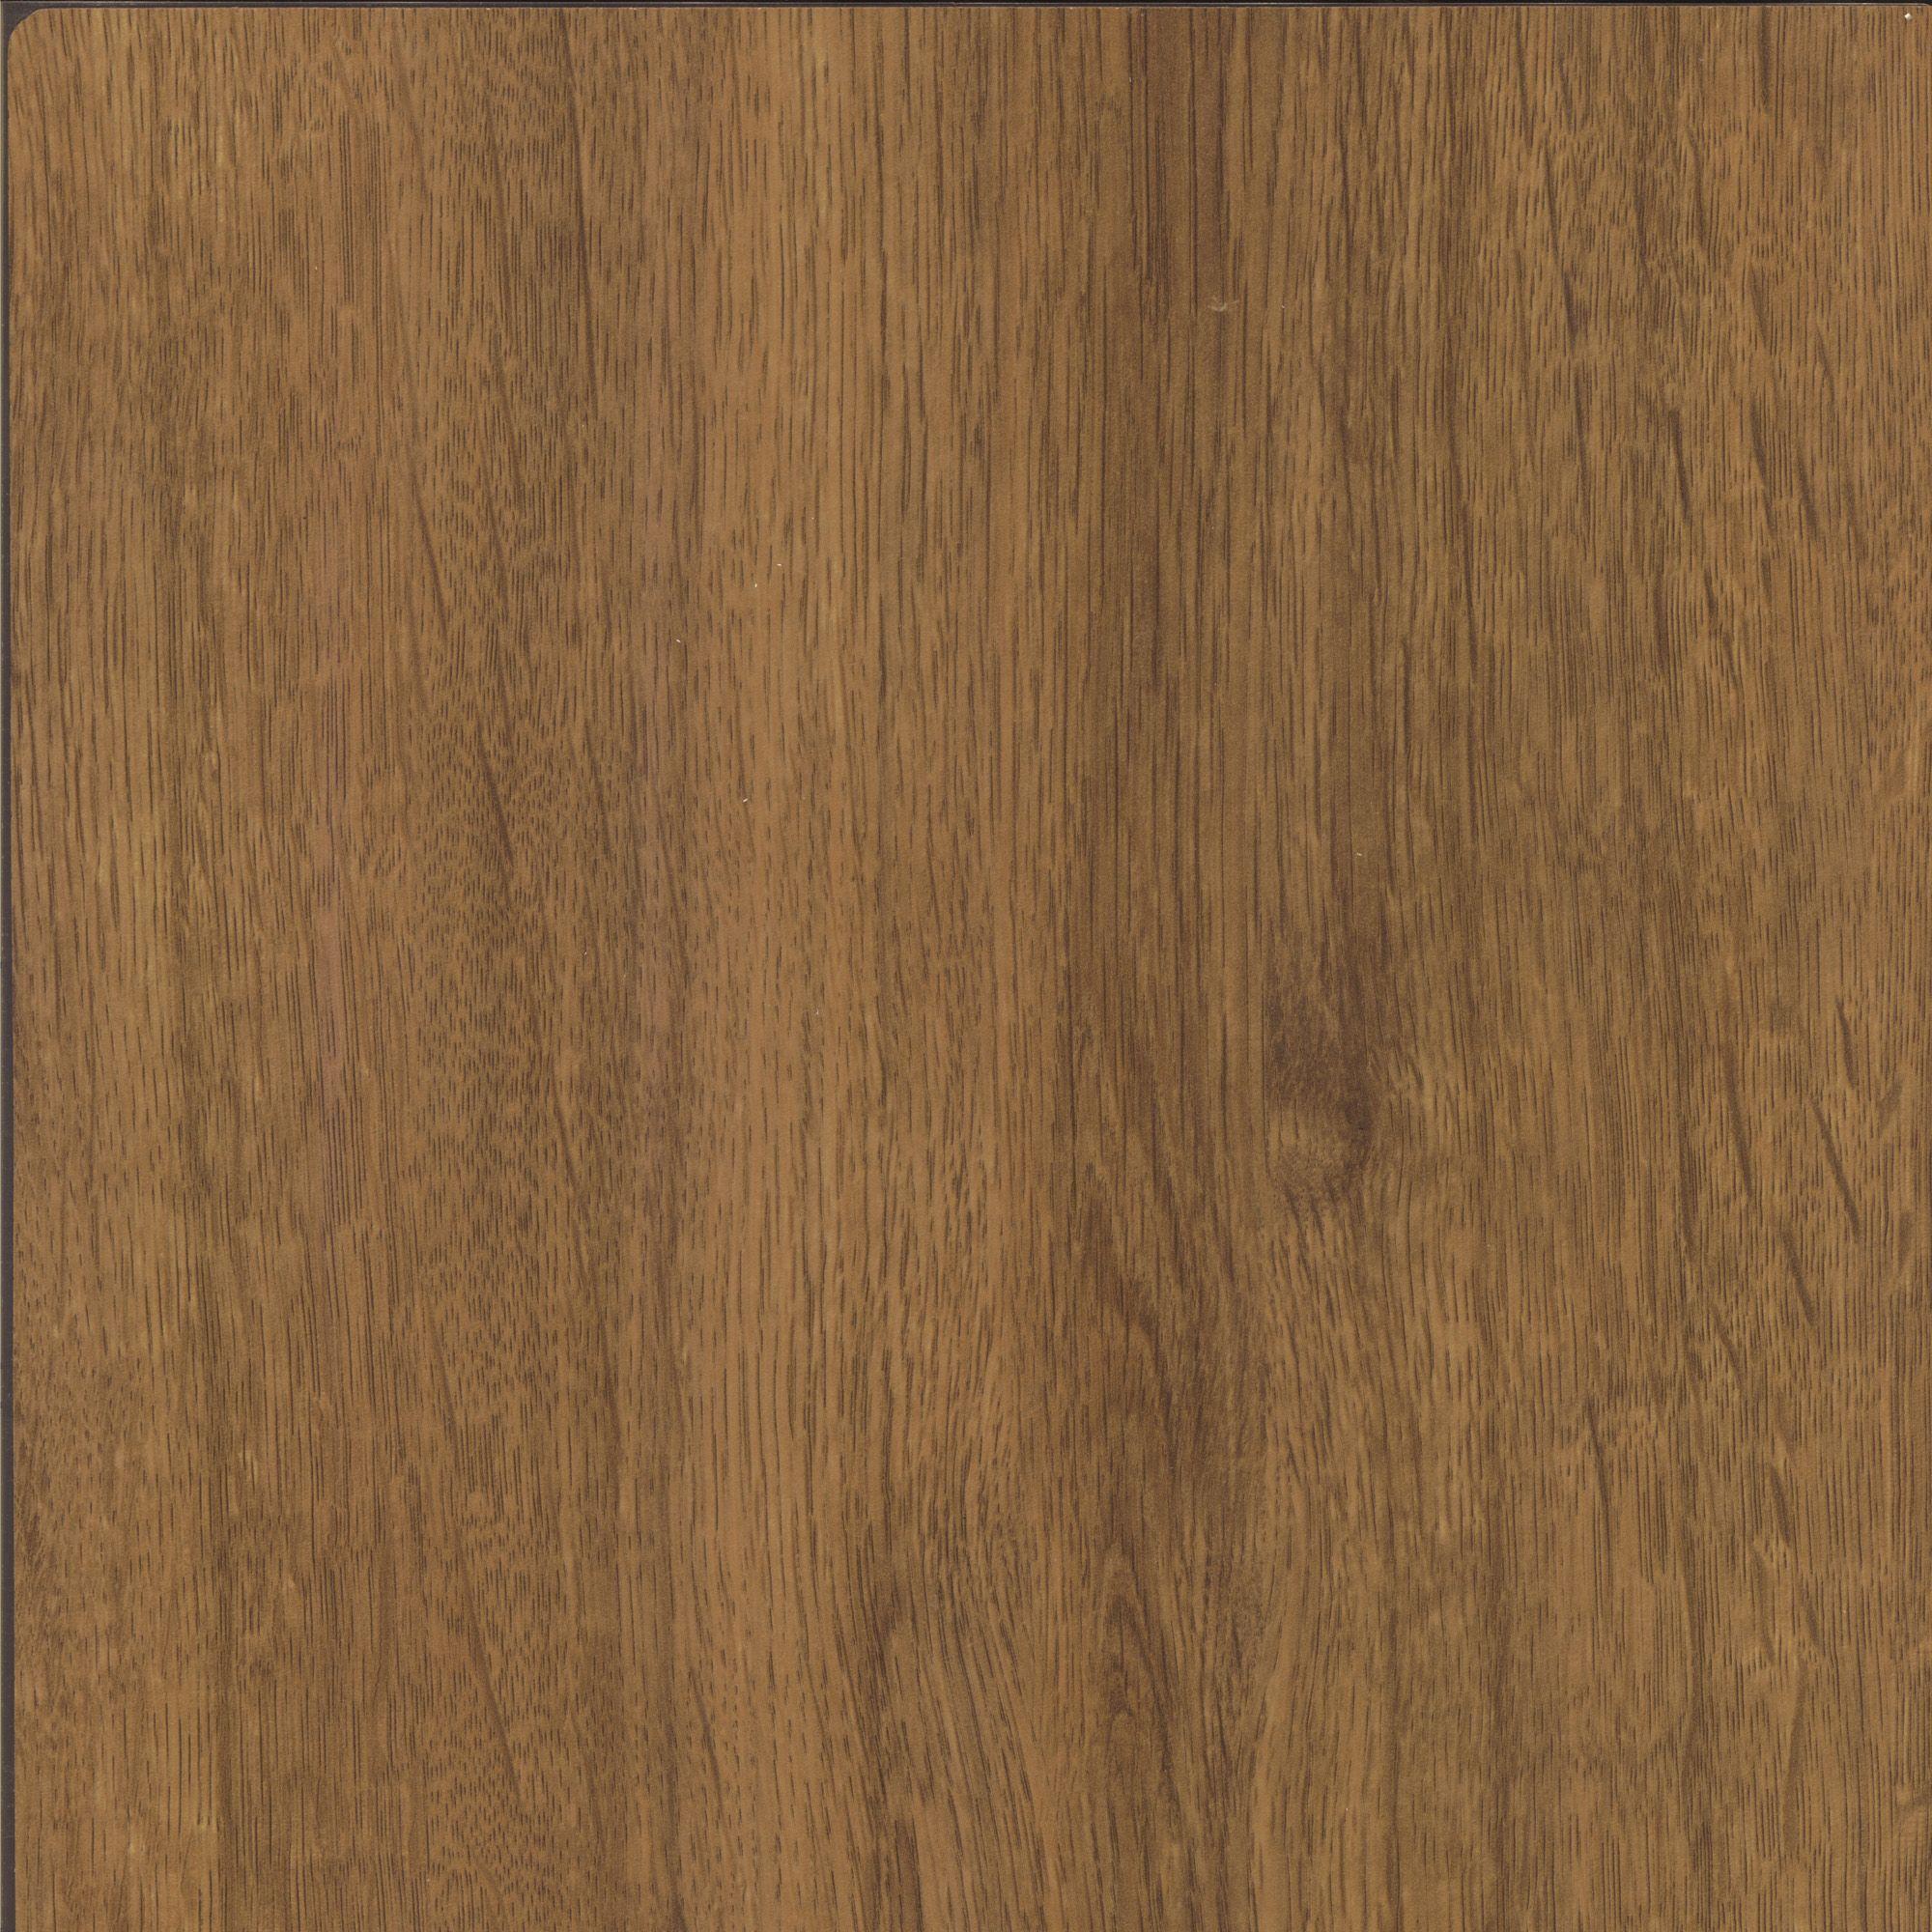 Concertino natural kolberg oak effect laminate flooring 0 for B q laminate flooring